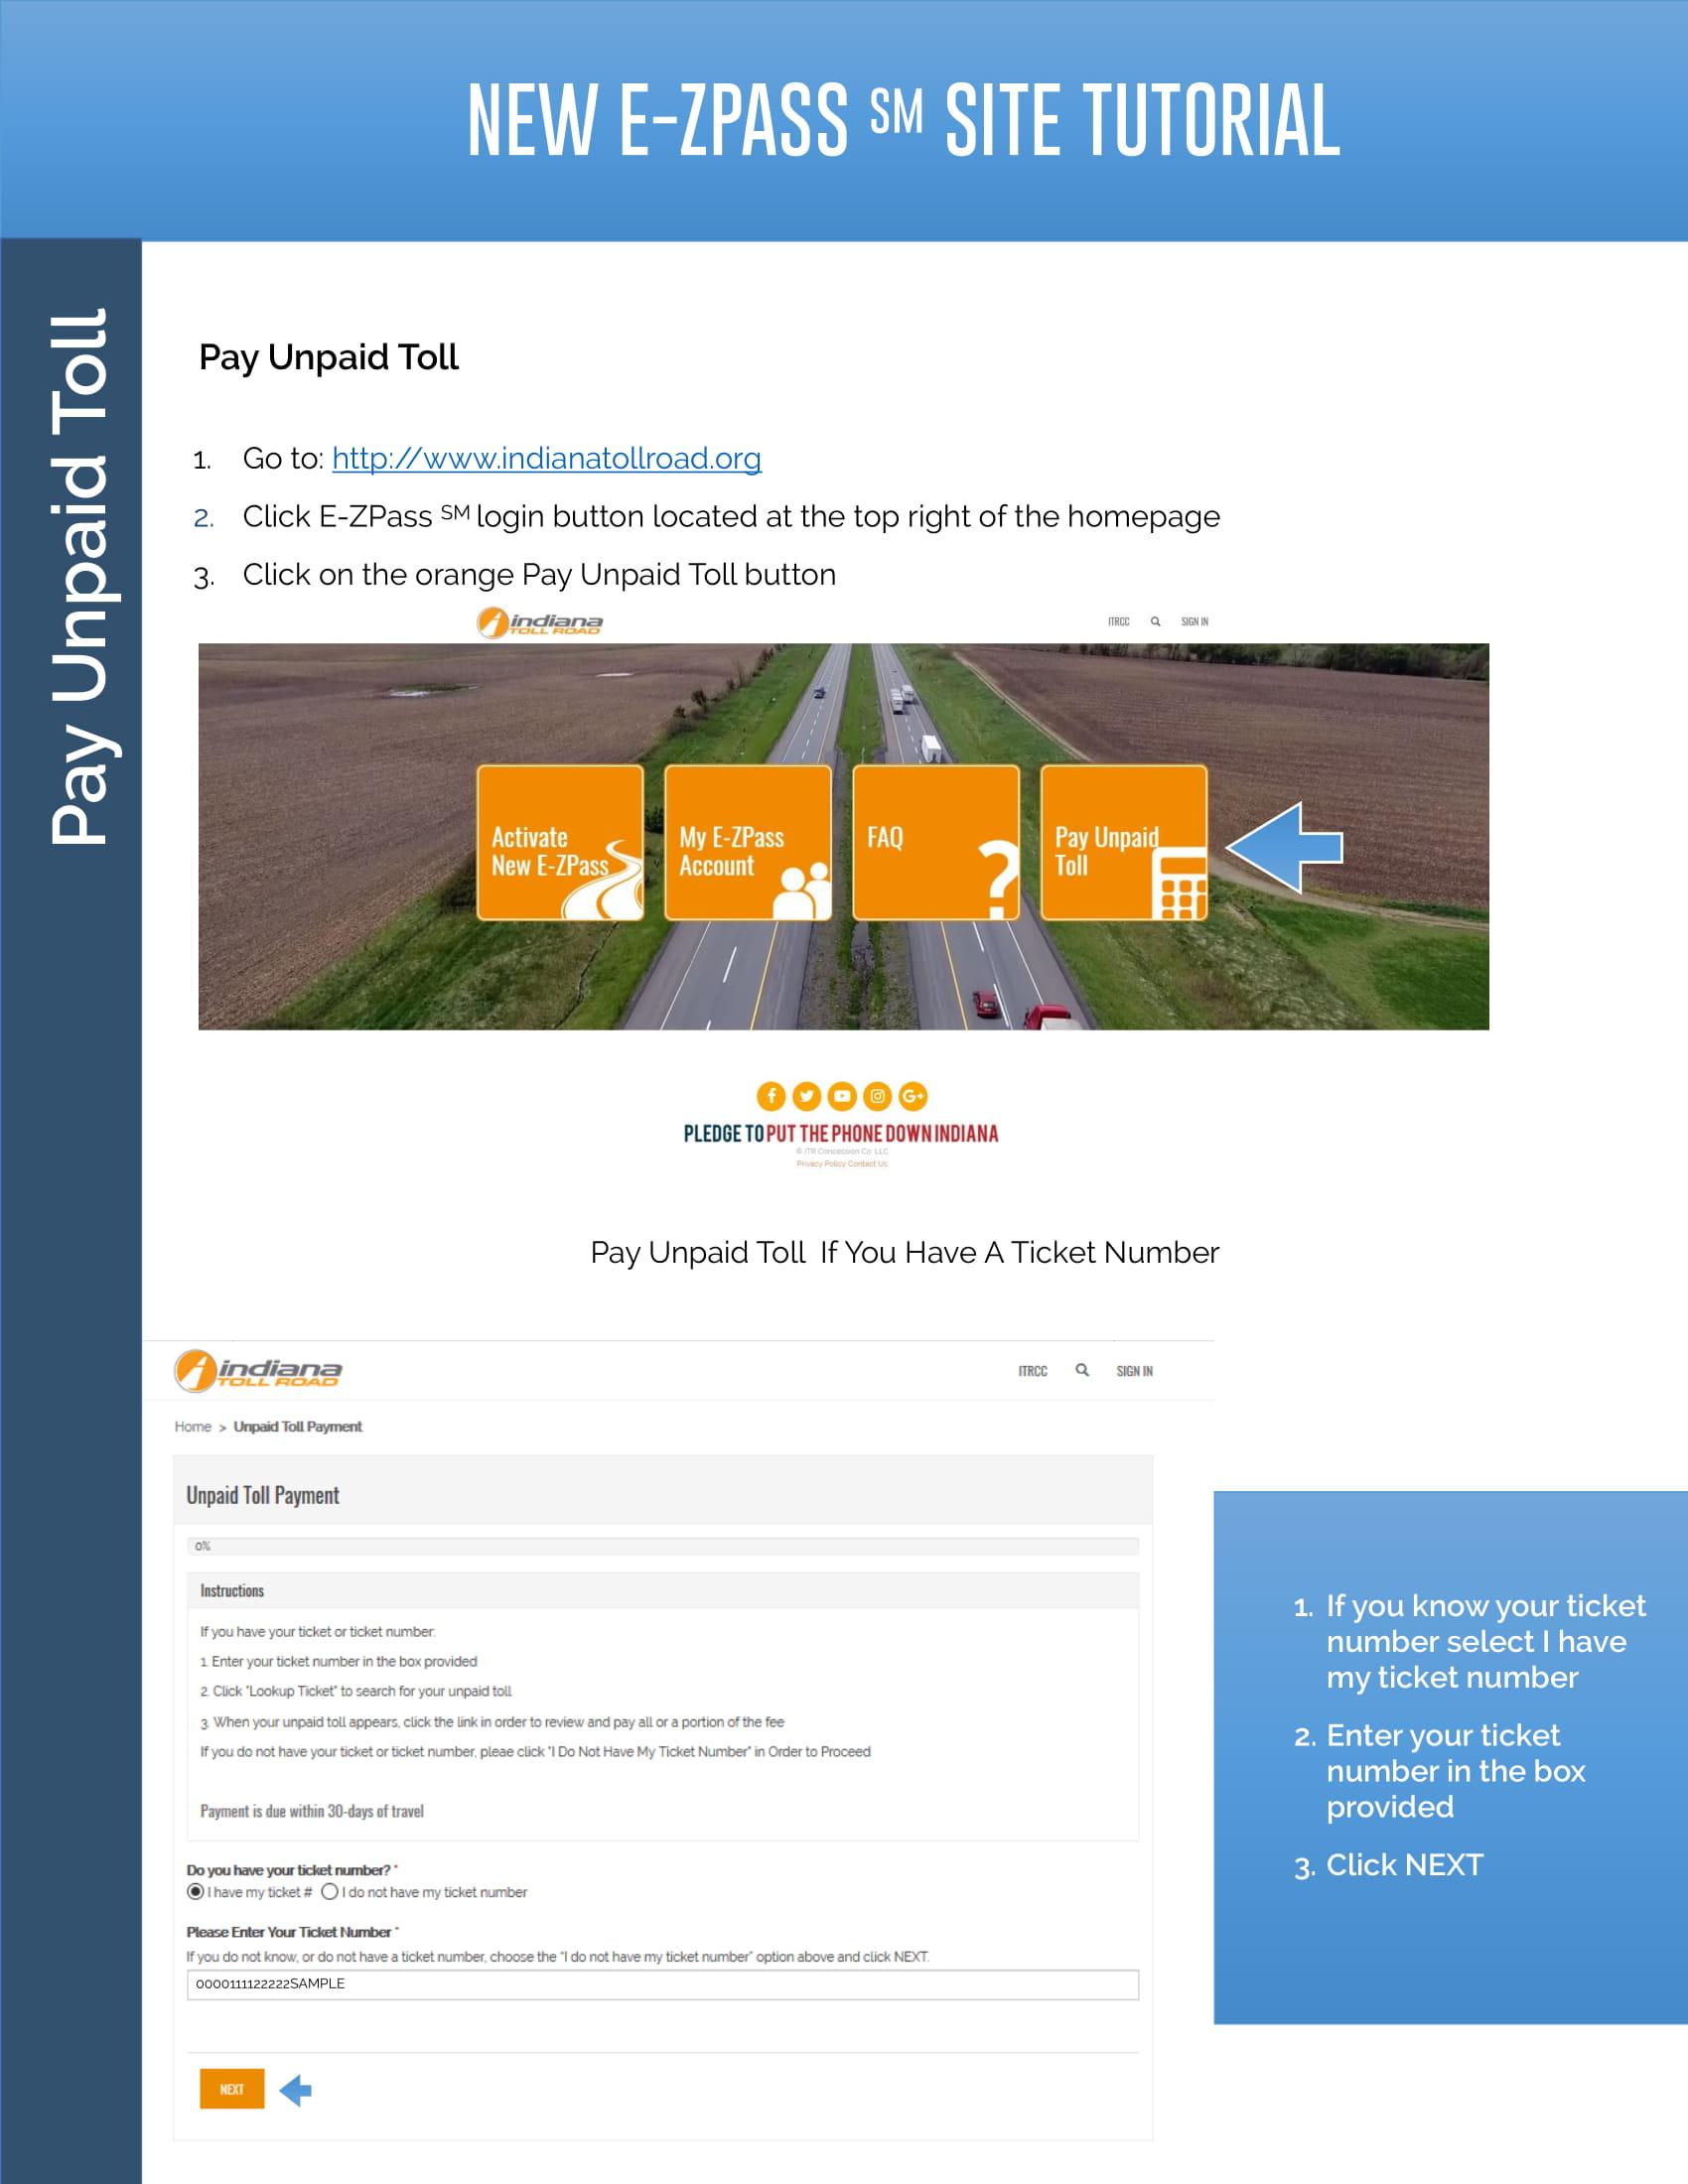 Pay Unpaid Toll Tutorial - ITR Concession Co  LLC